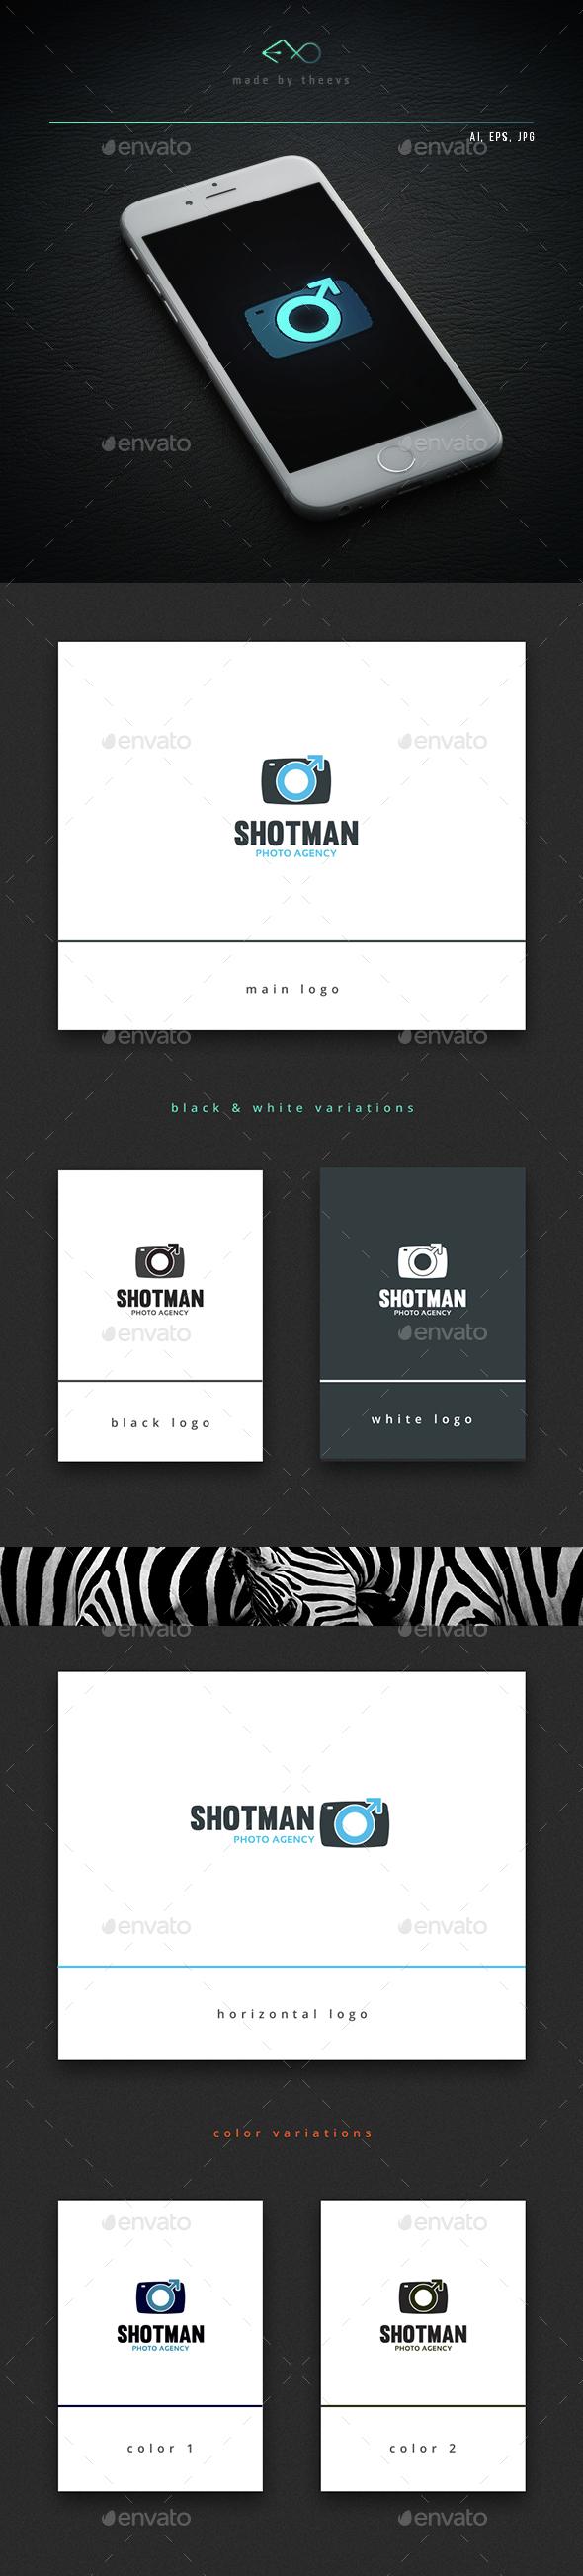 Shotman - Vector Abstract